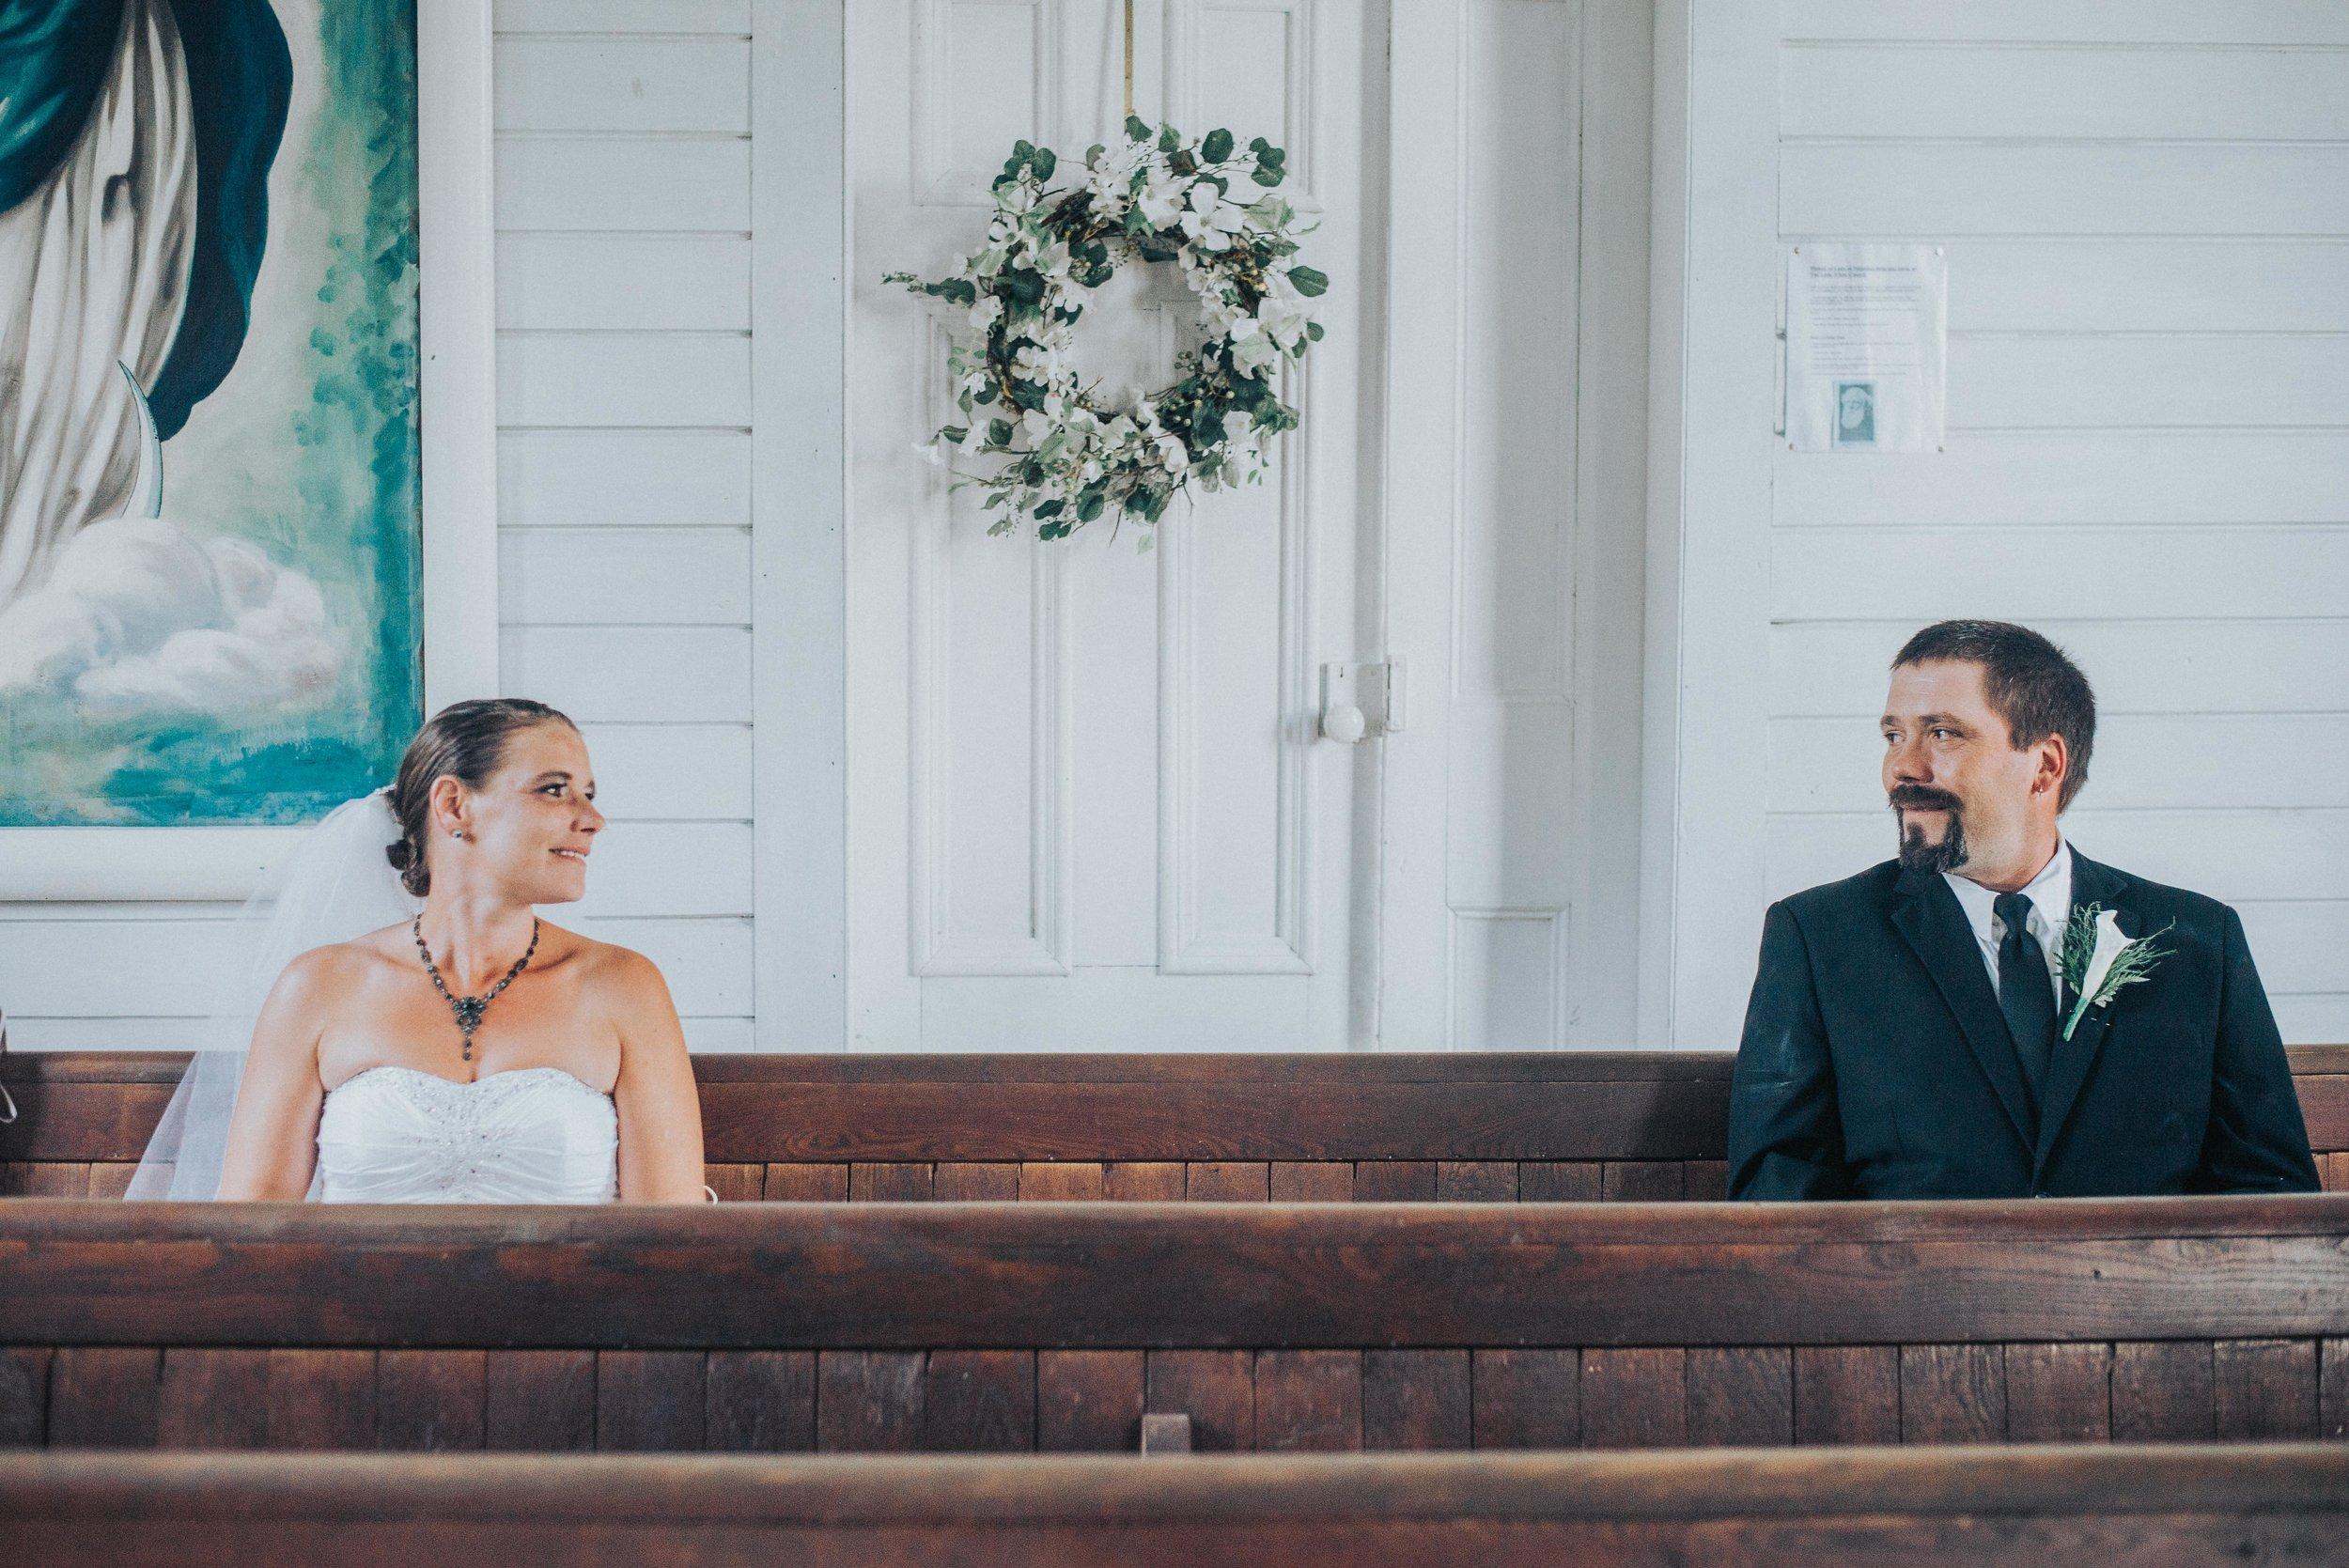 wedding2 (1 of 1).jpg